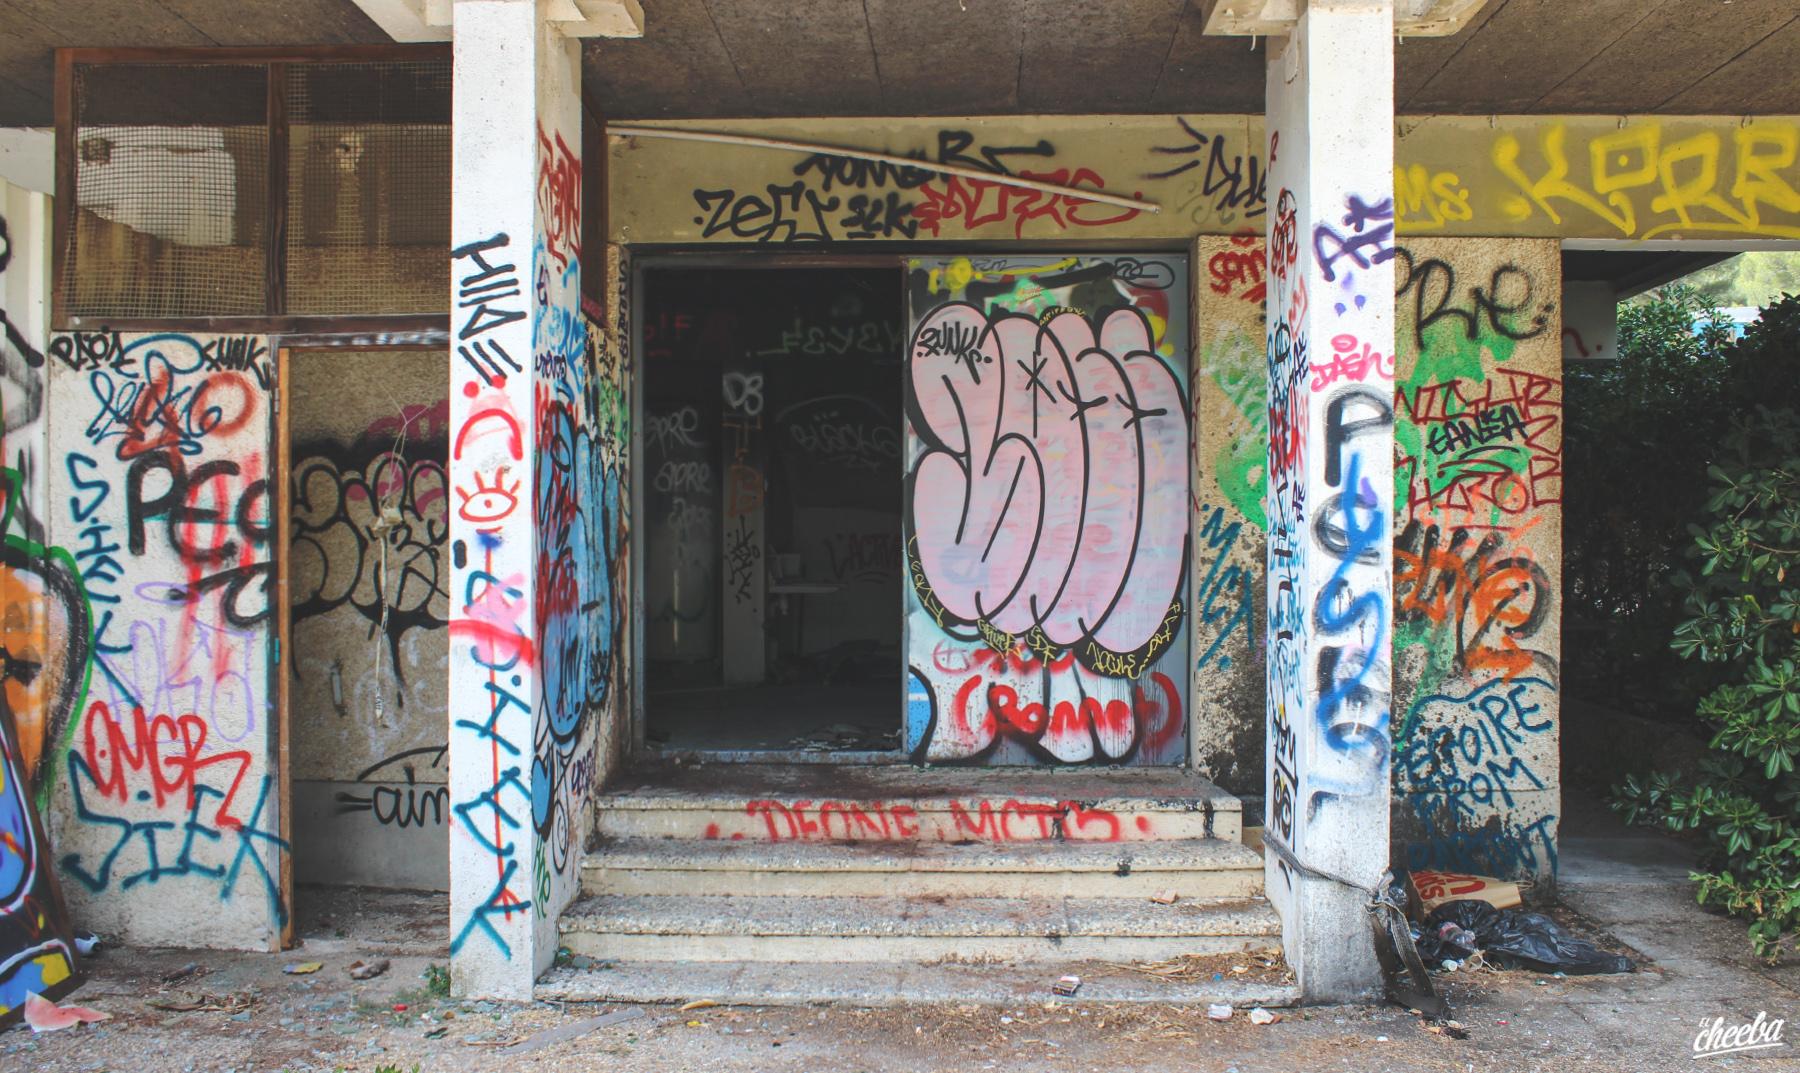 Urbex à la piscine de Luminy, abandonnée à Marseille - Urbex Paca